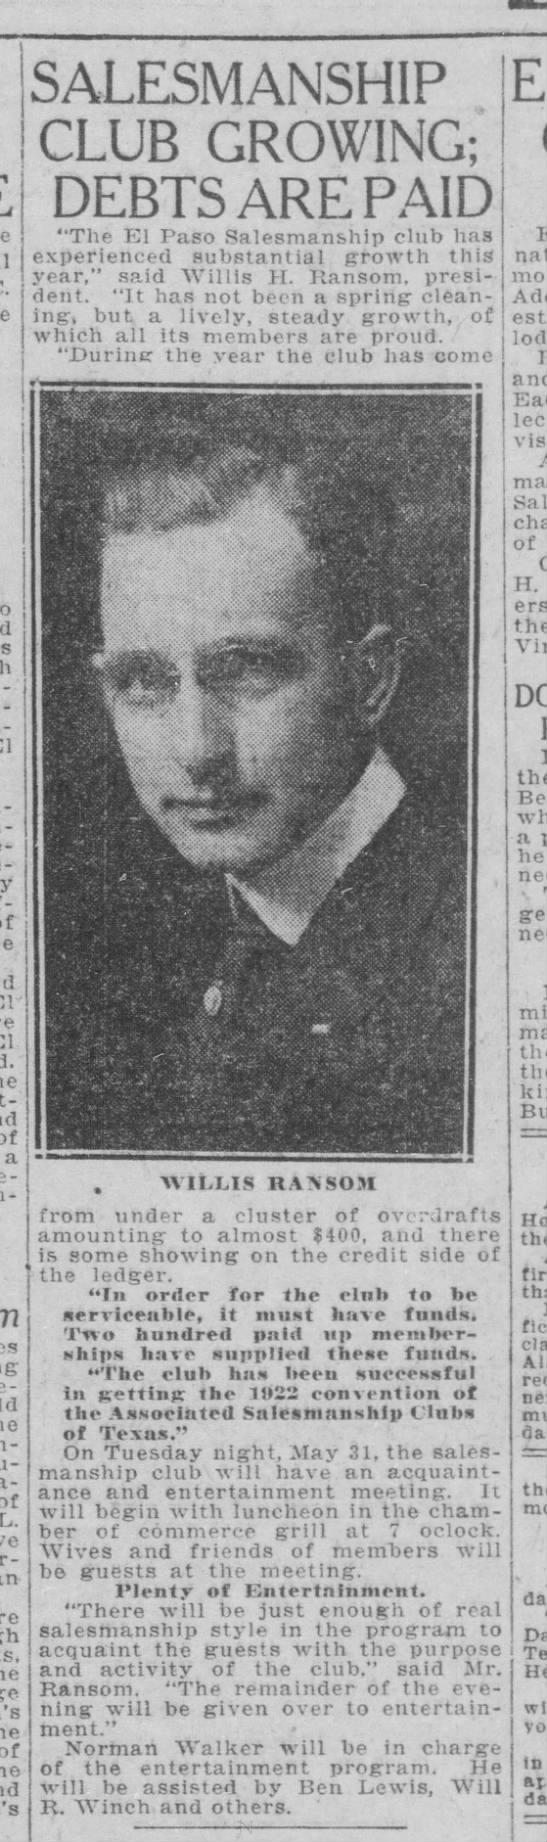 El Paso Salesmanship Club, May 1921 - of a of L. he of SALESMANSHIP CLUB GROWING;...